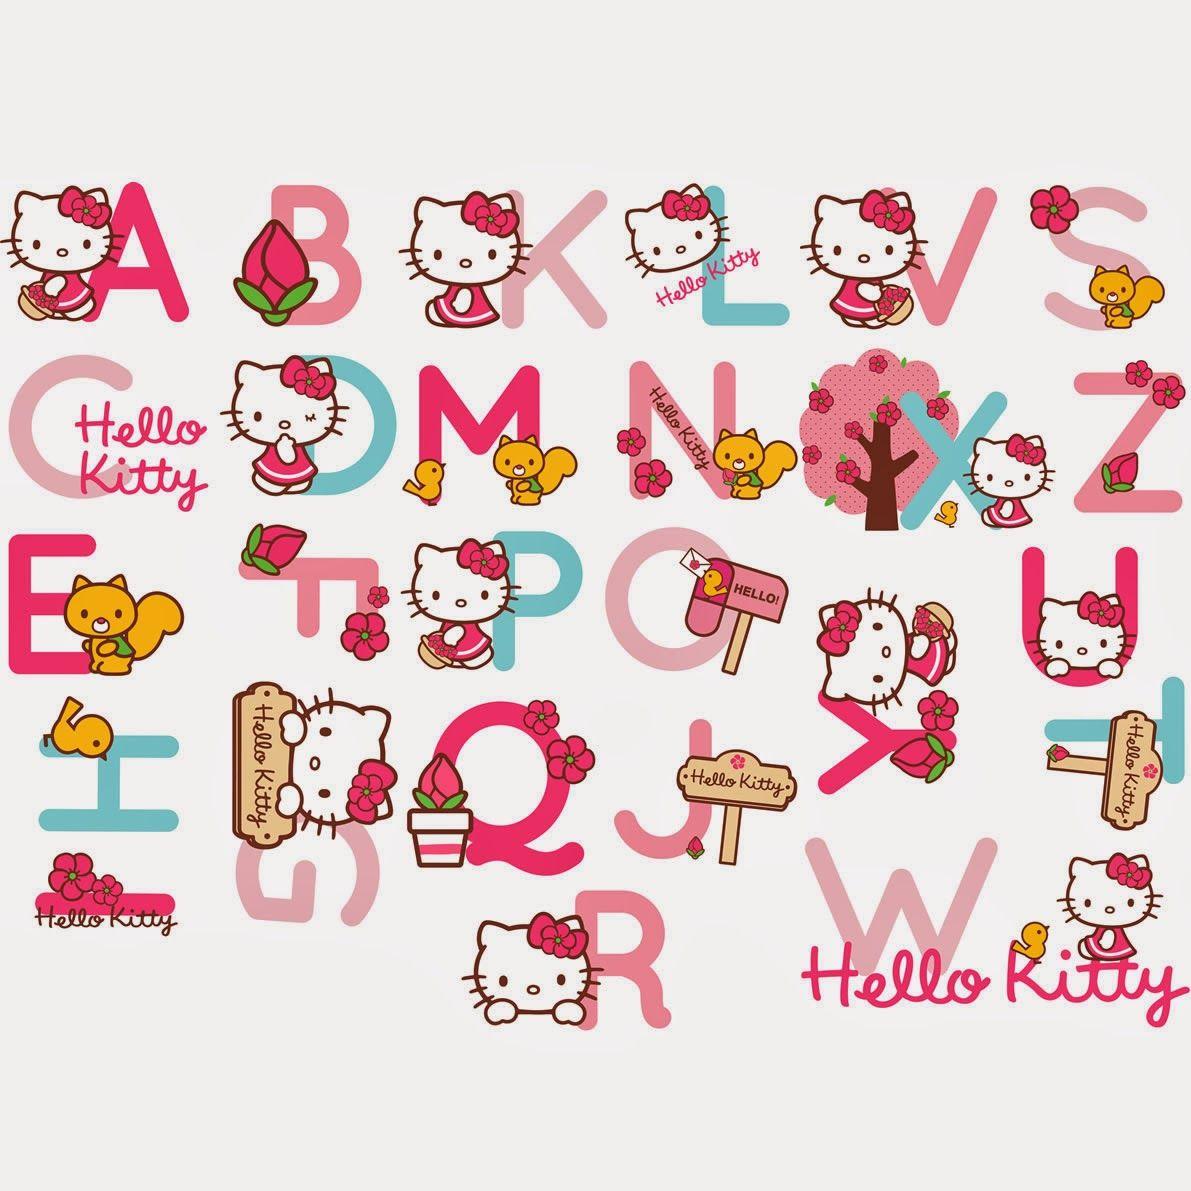 Alfabeto De Hello Kitty Con Accesorios. | 卡通凱蒂喵~ | Sanrio Hello - Free Printable Hello Kitty Alphabet Letters